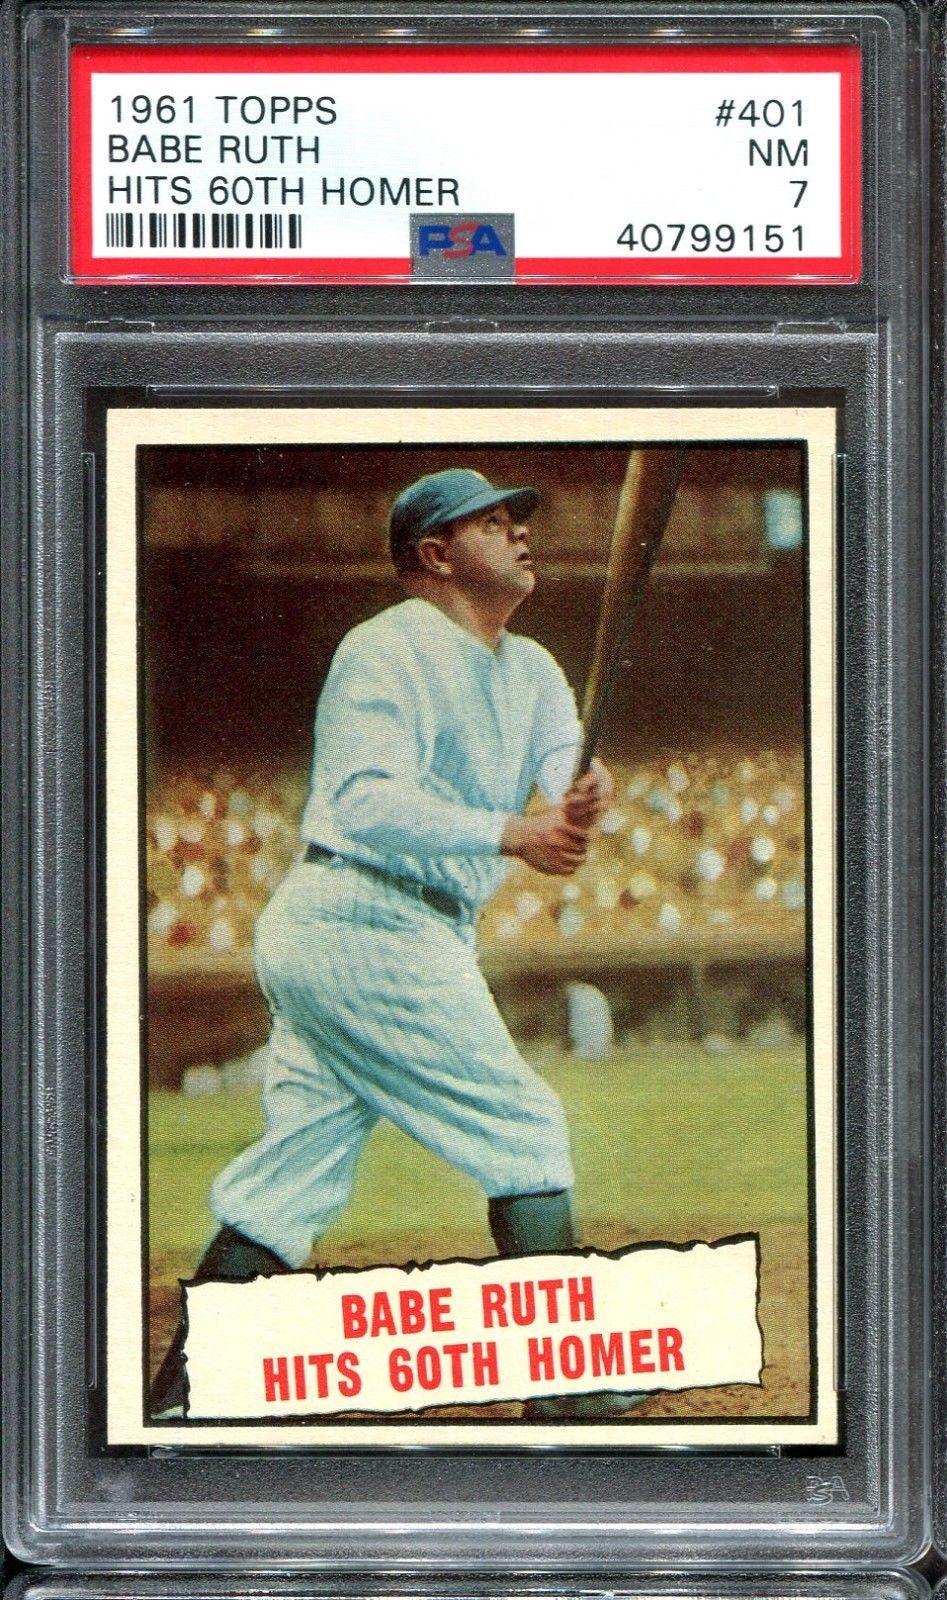 1961 topps 401 babe ruth hits 60th homer psa 7 very sharp